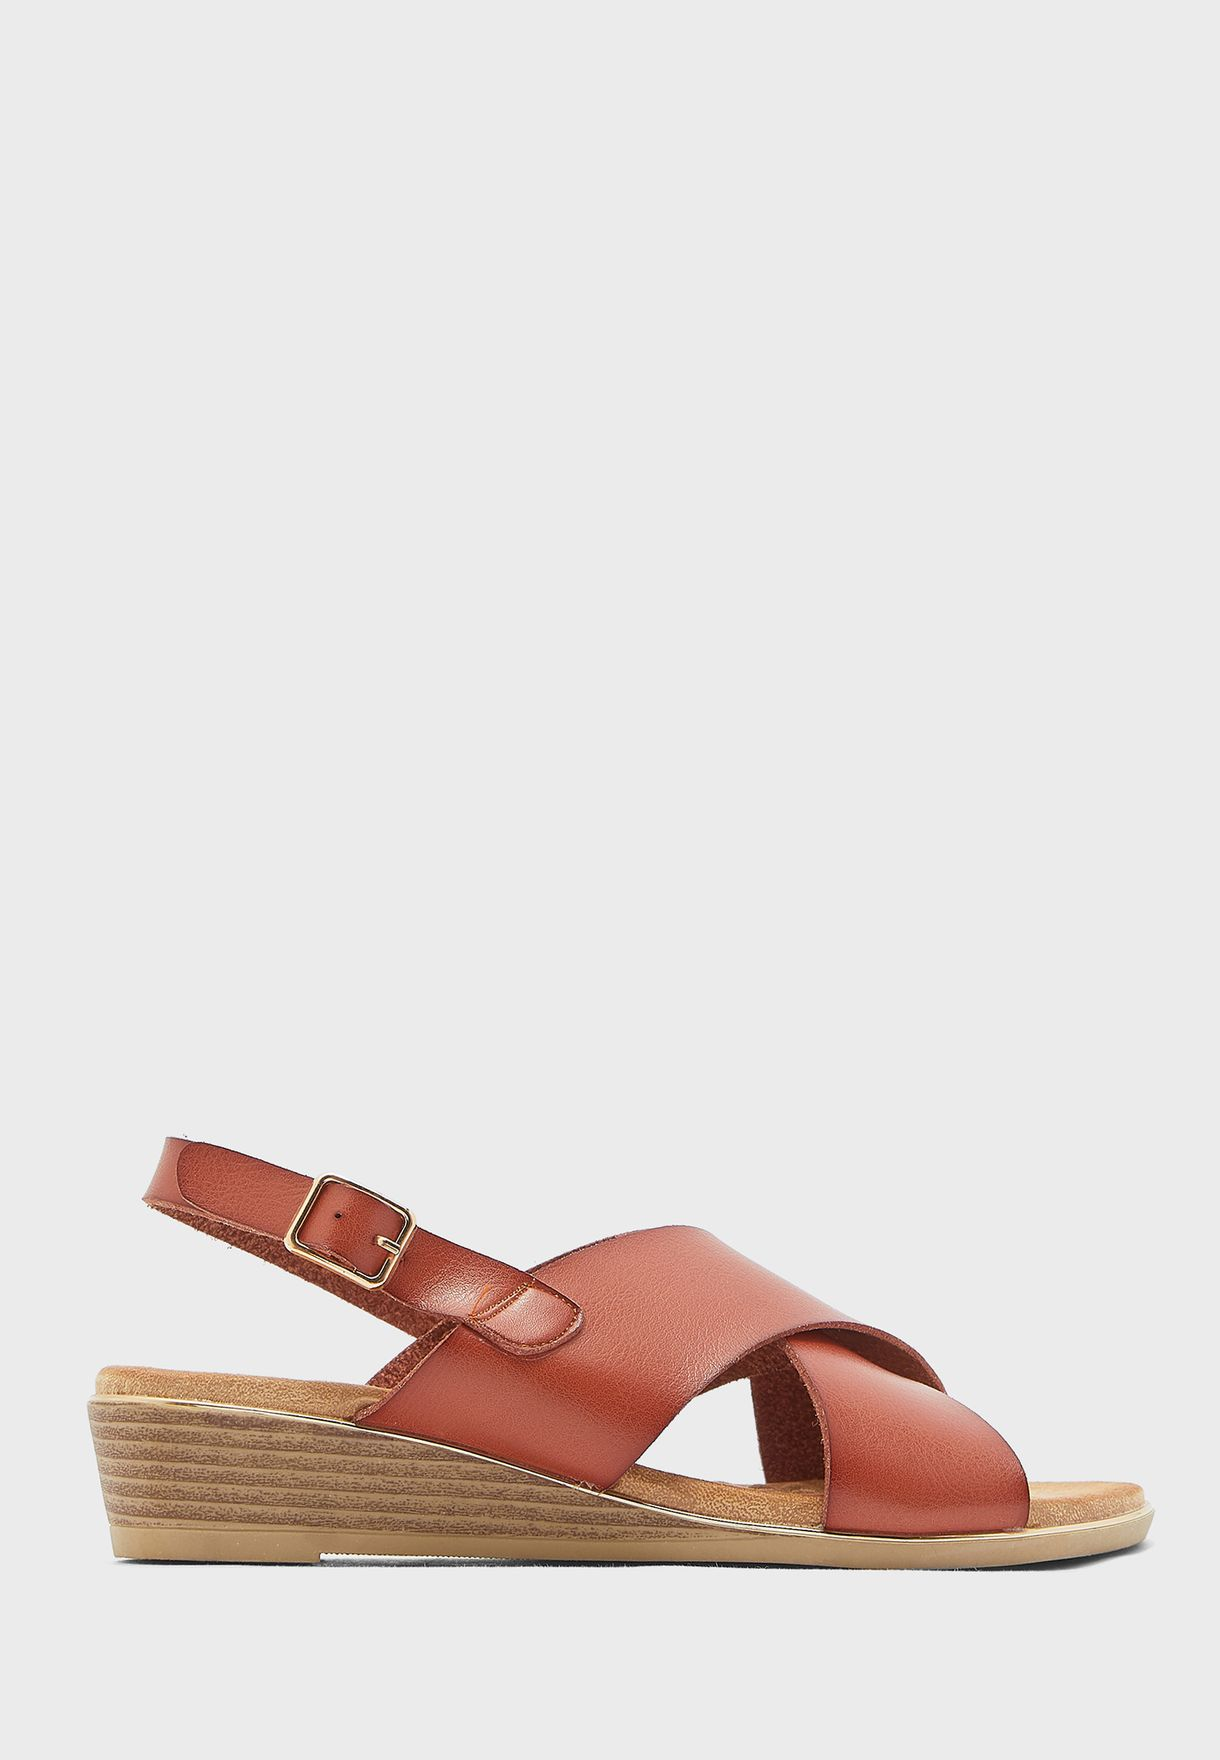 Sling Back Wedge Sandal